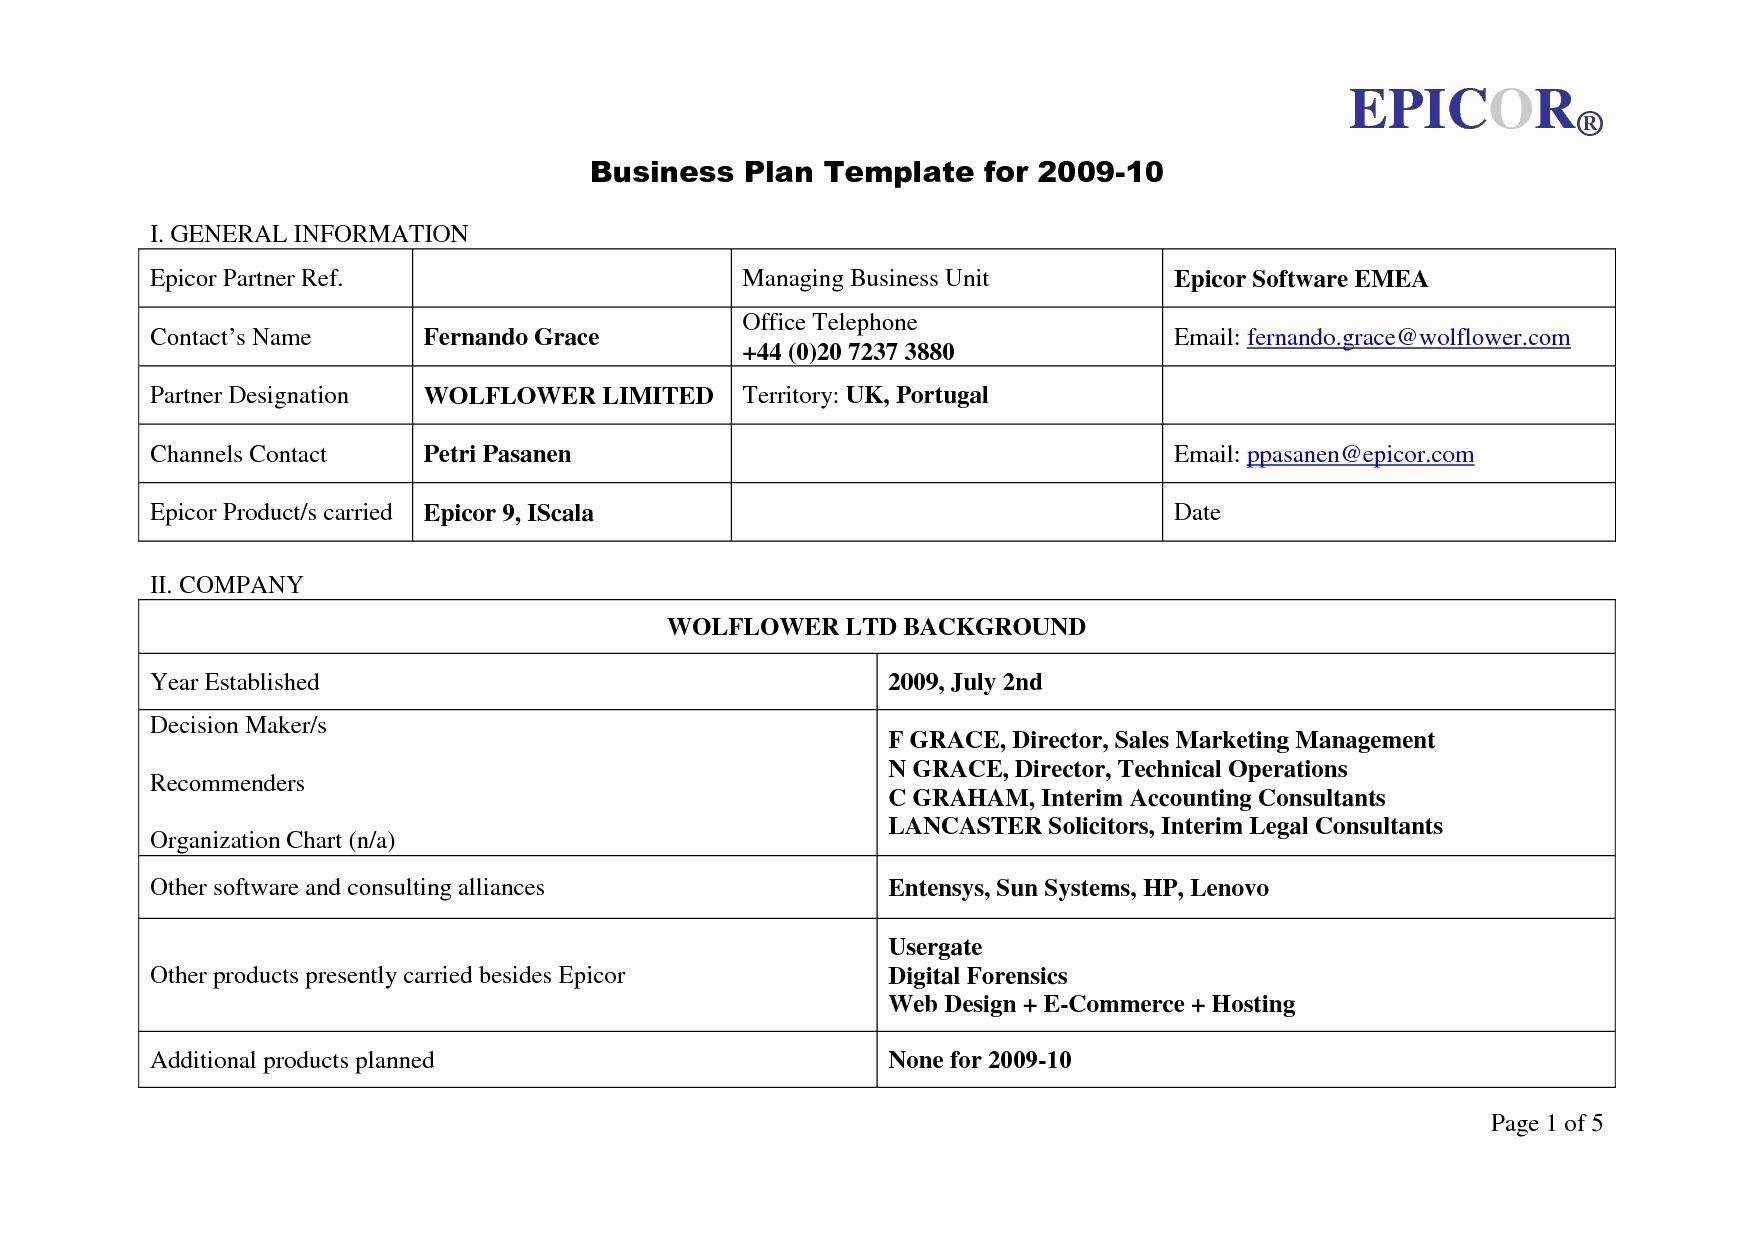 Estate Planning Worksheet Template Best Of 27 Awesome Estate Planning Worksheet Exce In 2020 Business Plan Template Simple Business Plan Template Business Plan Example